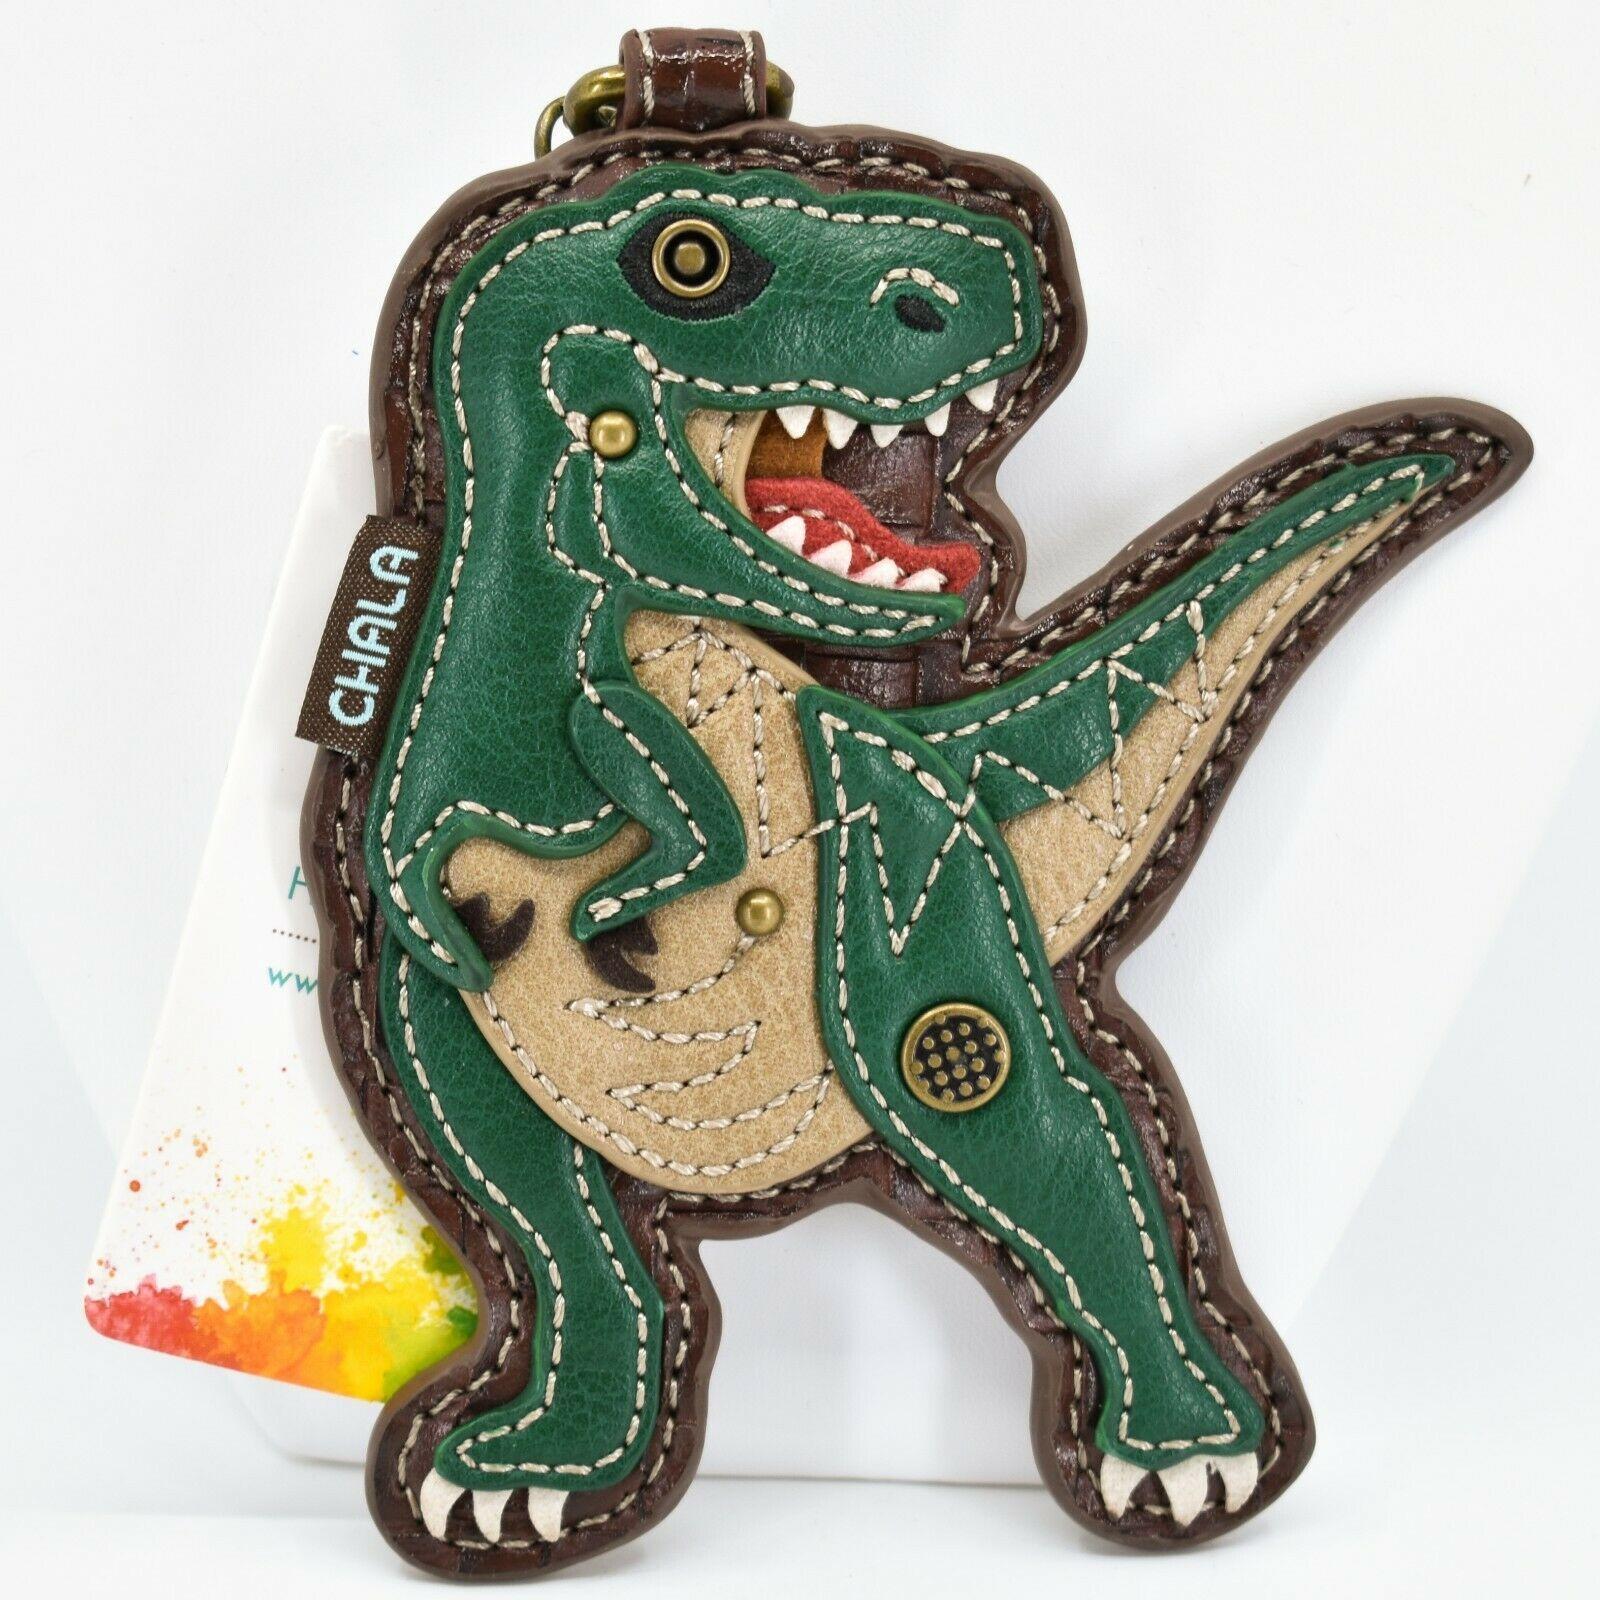 Chala Handbags Faux Leather Tyrannosaurus Rex T-Rex Dinosaur Coin Purse Keychain